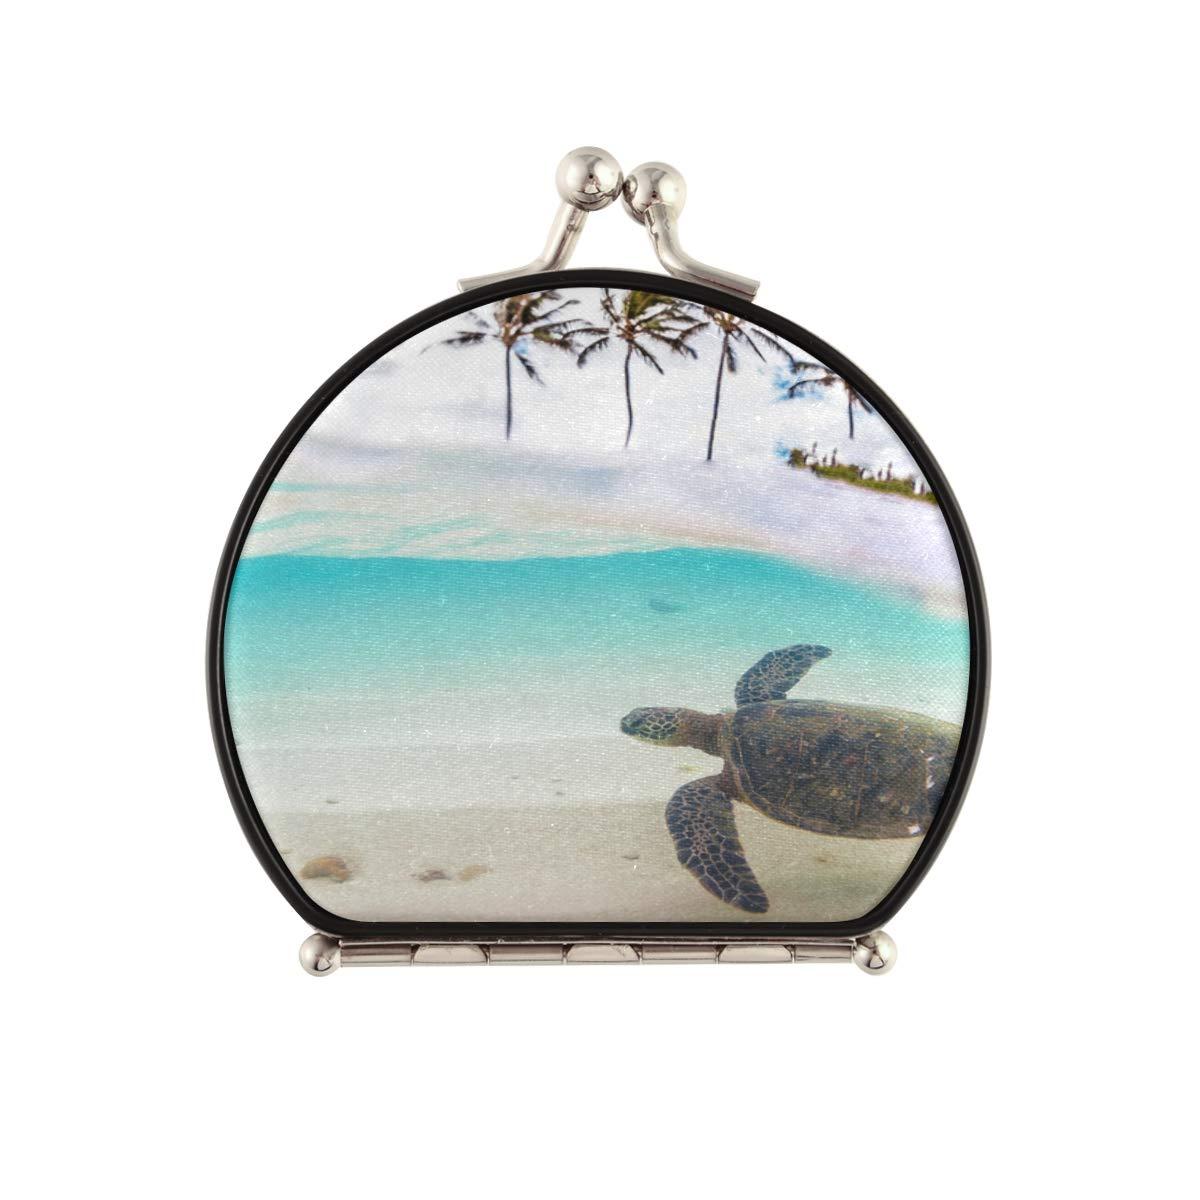 New life Magnifying Compact Cosmetic Mirror Green Endangered Sea Hawaiian price